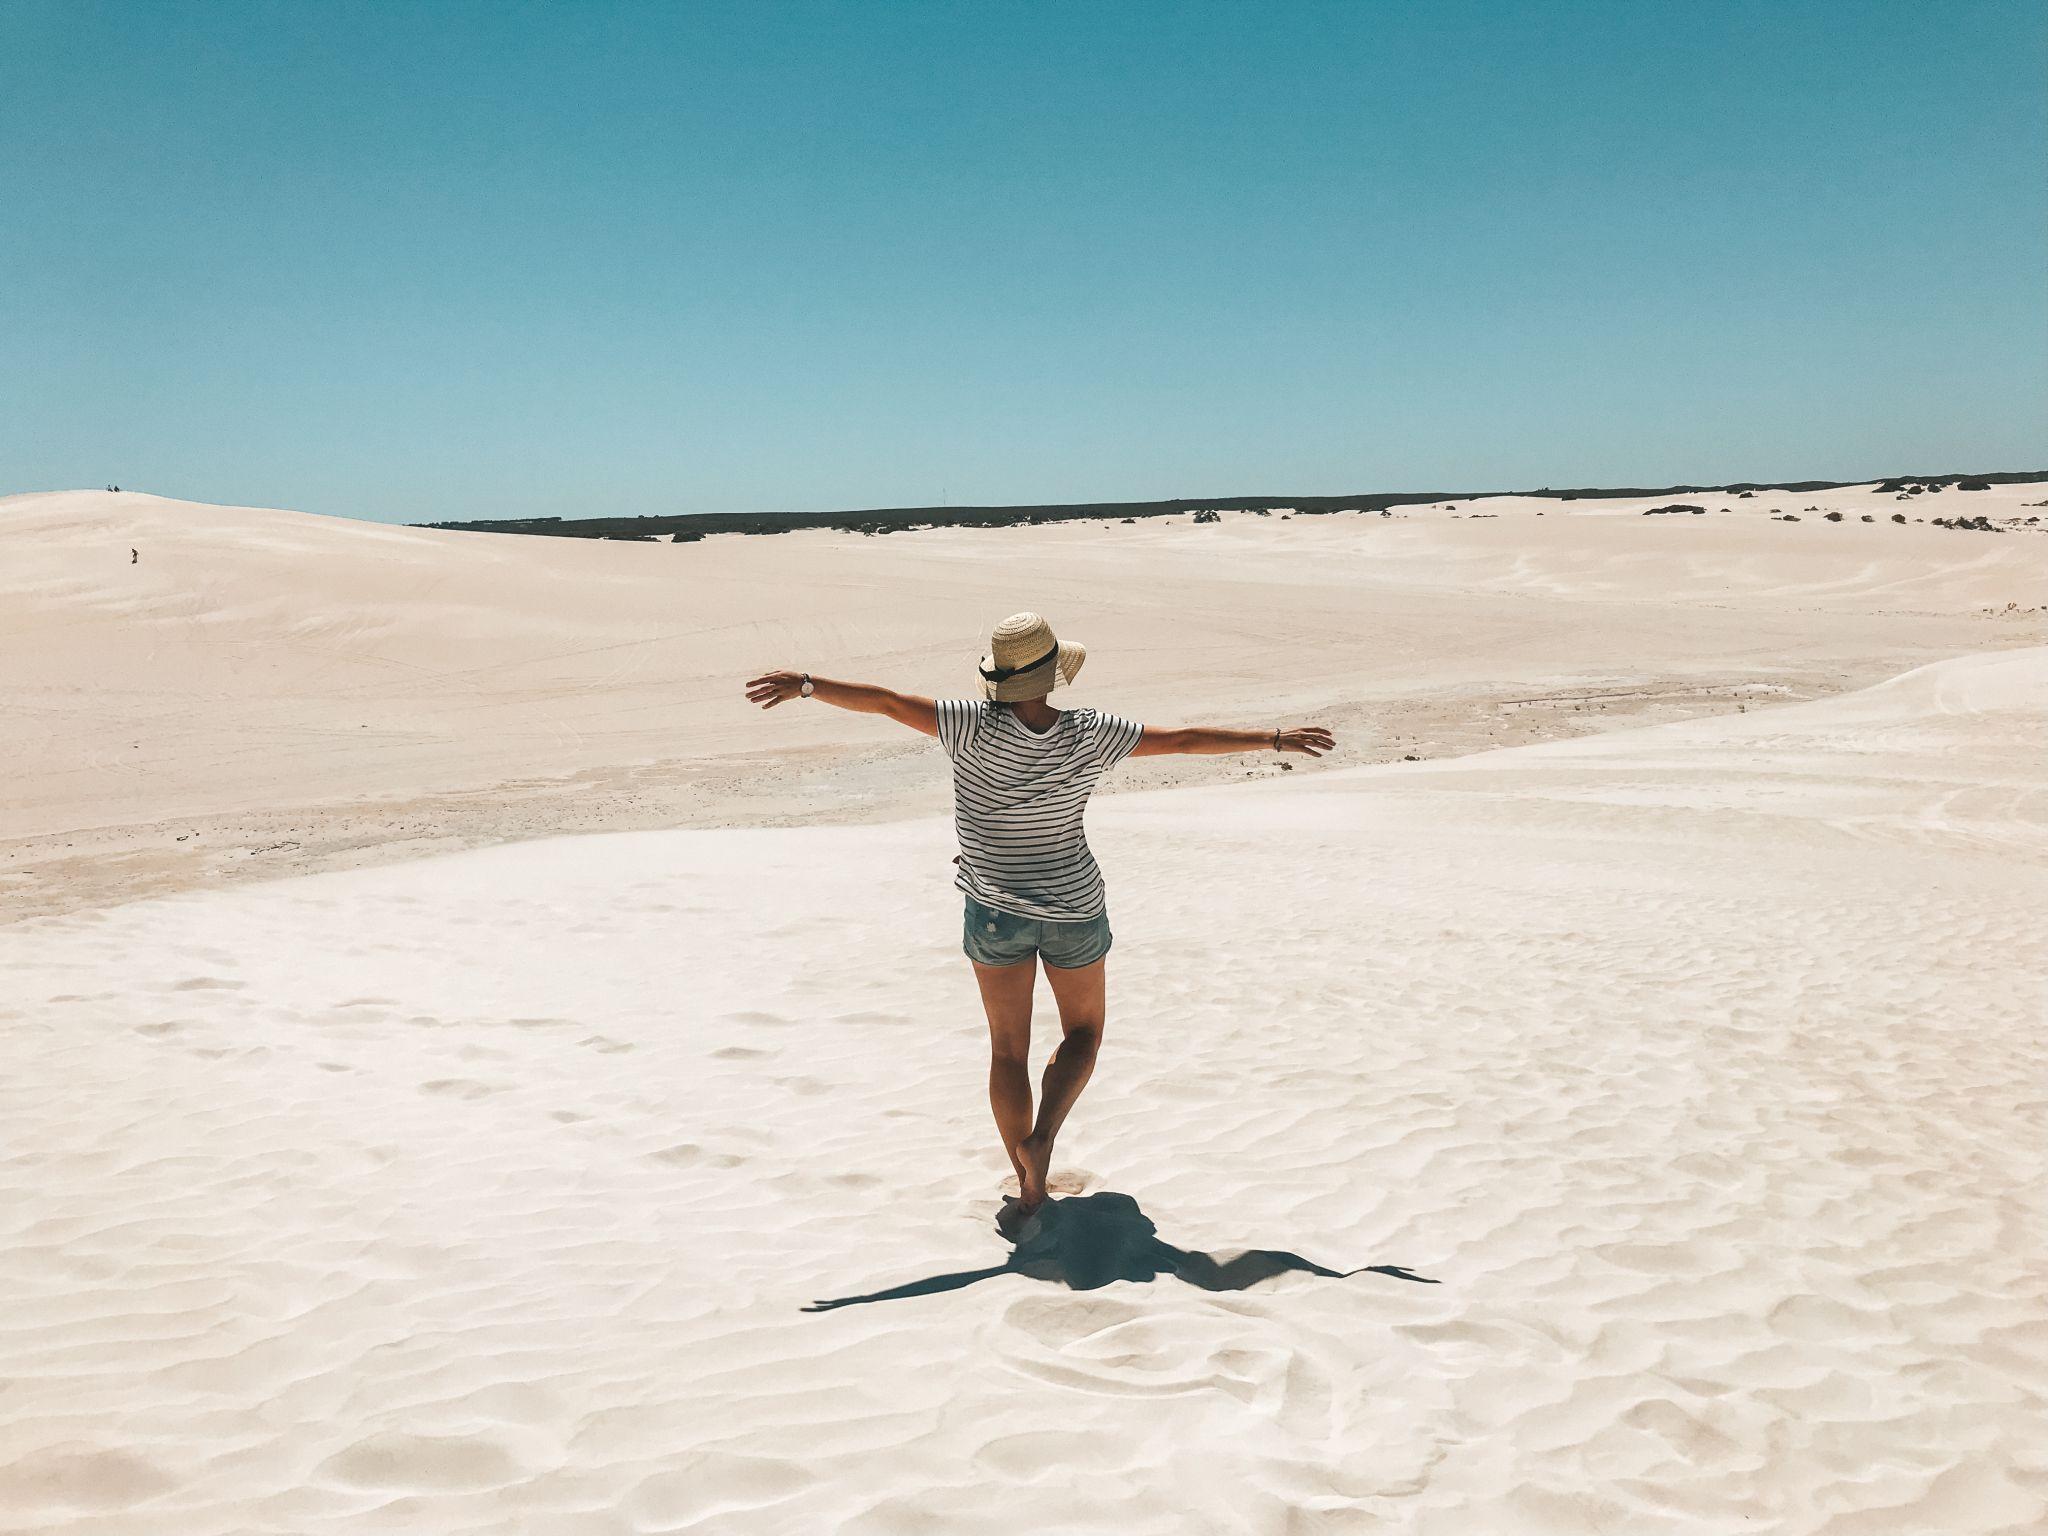 jana meerman lancelin sandboarding australia (2)